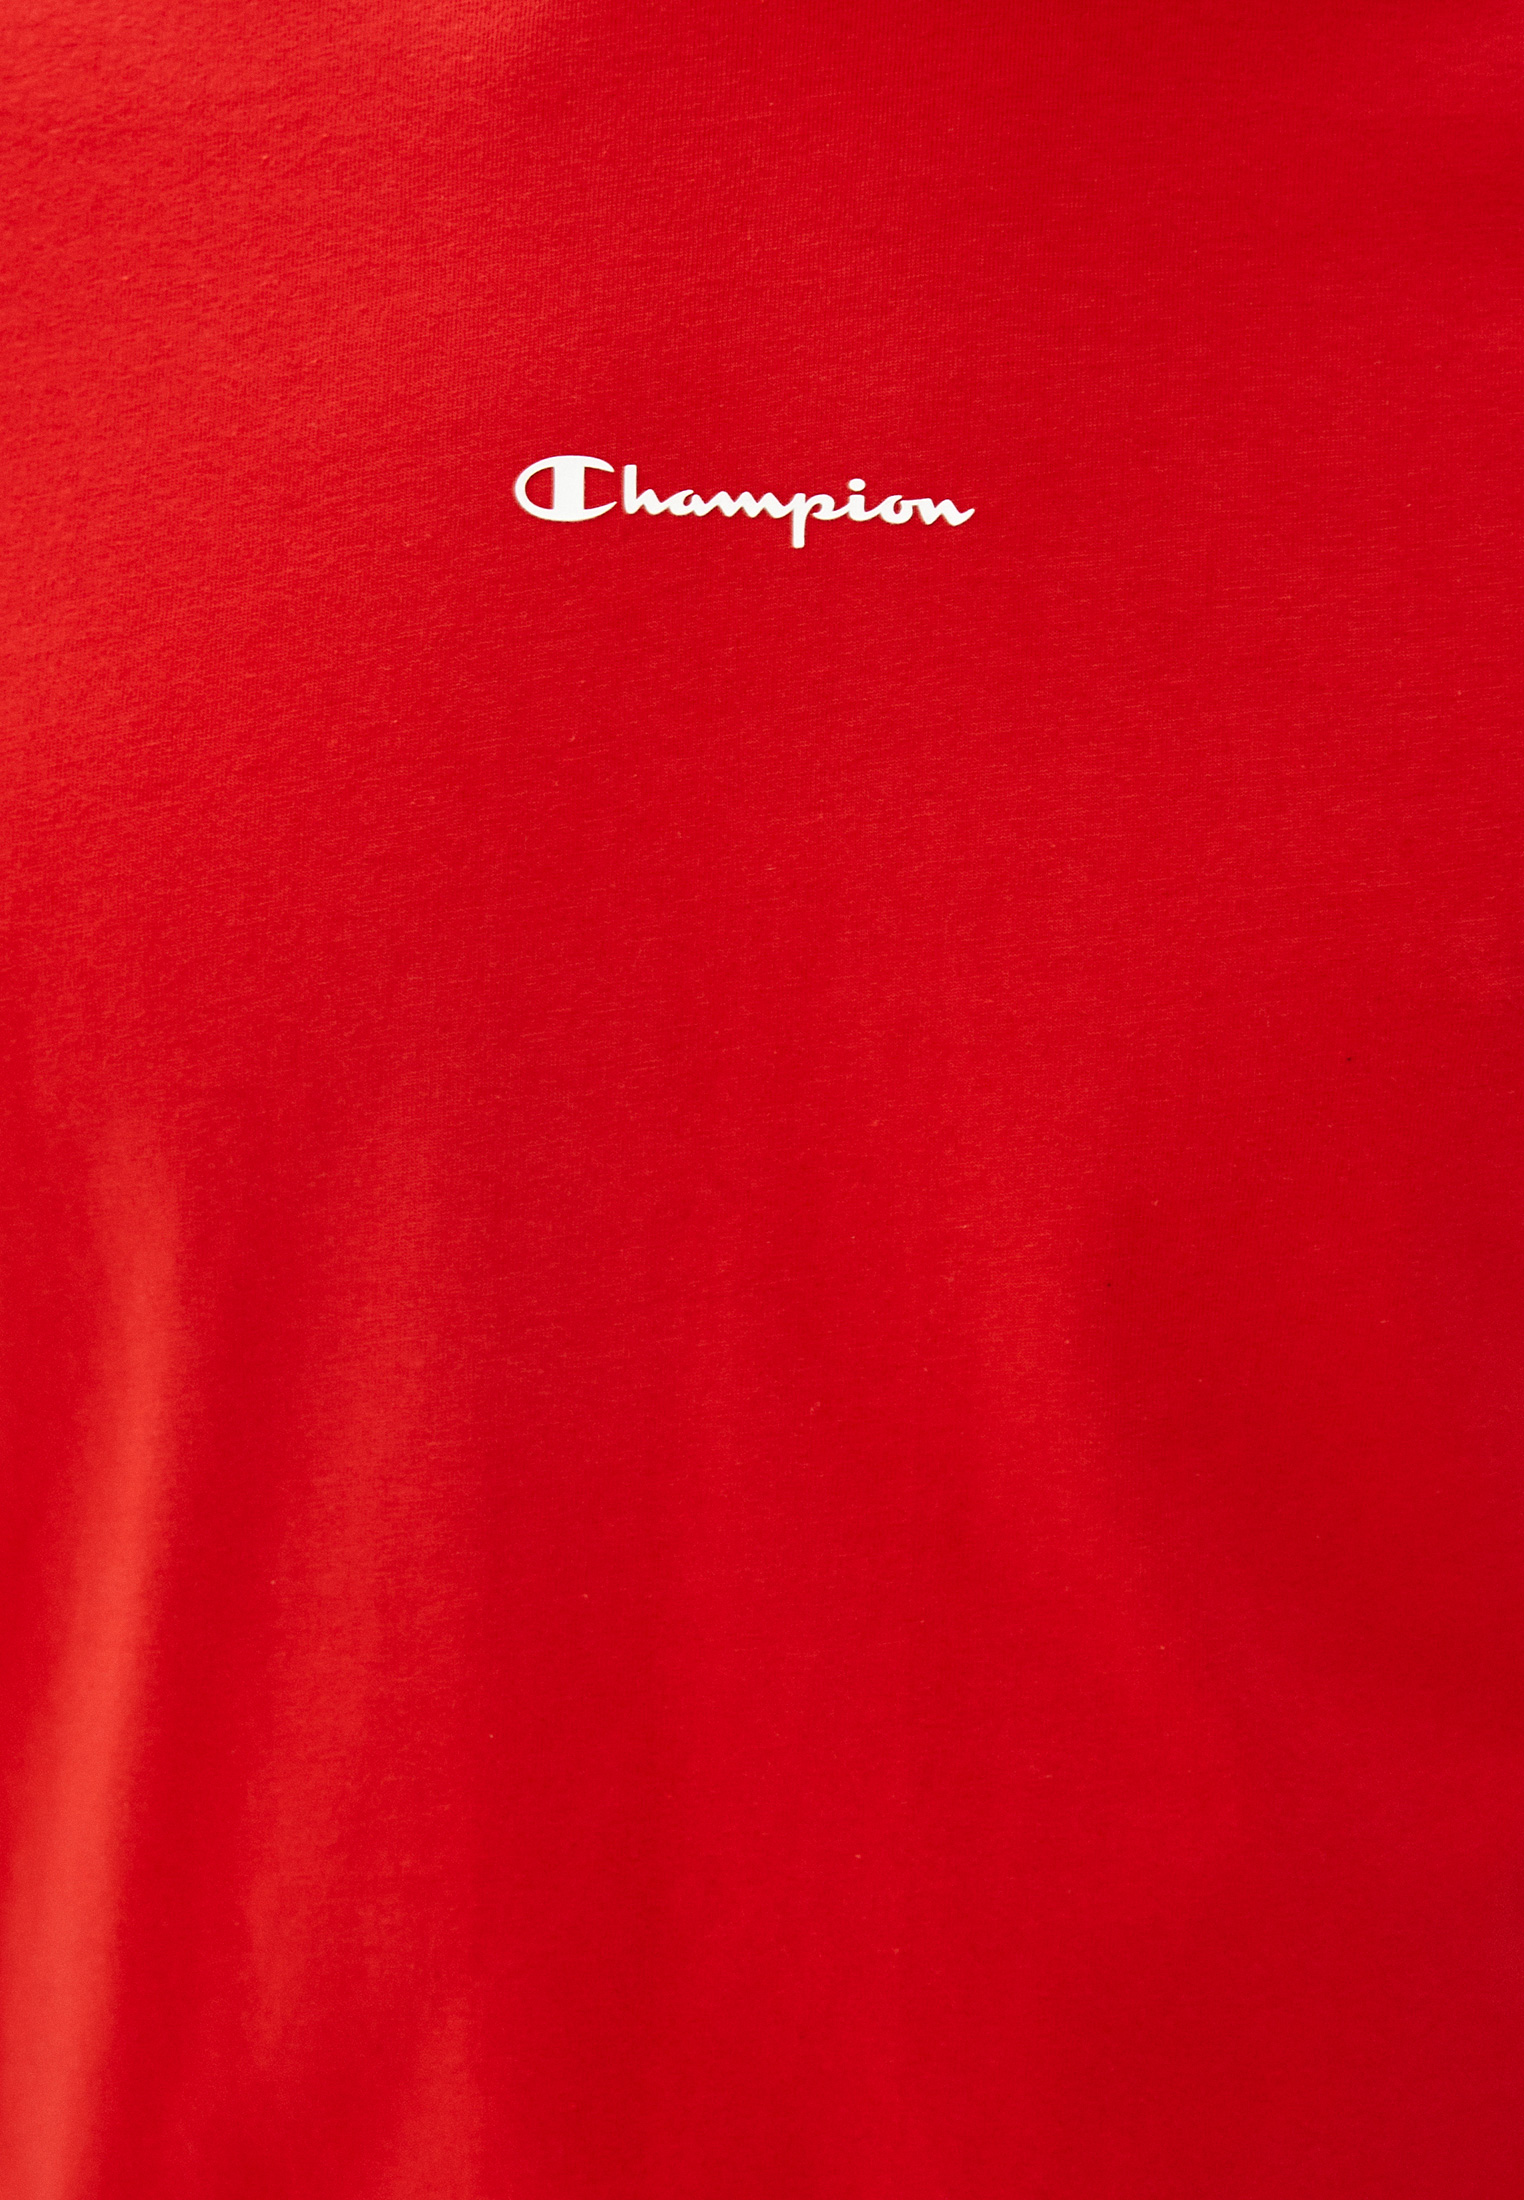 Футболка Champion (Чемпион) 214229: изображение 4